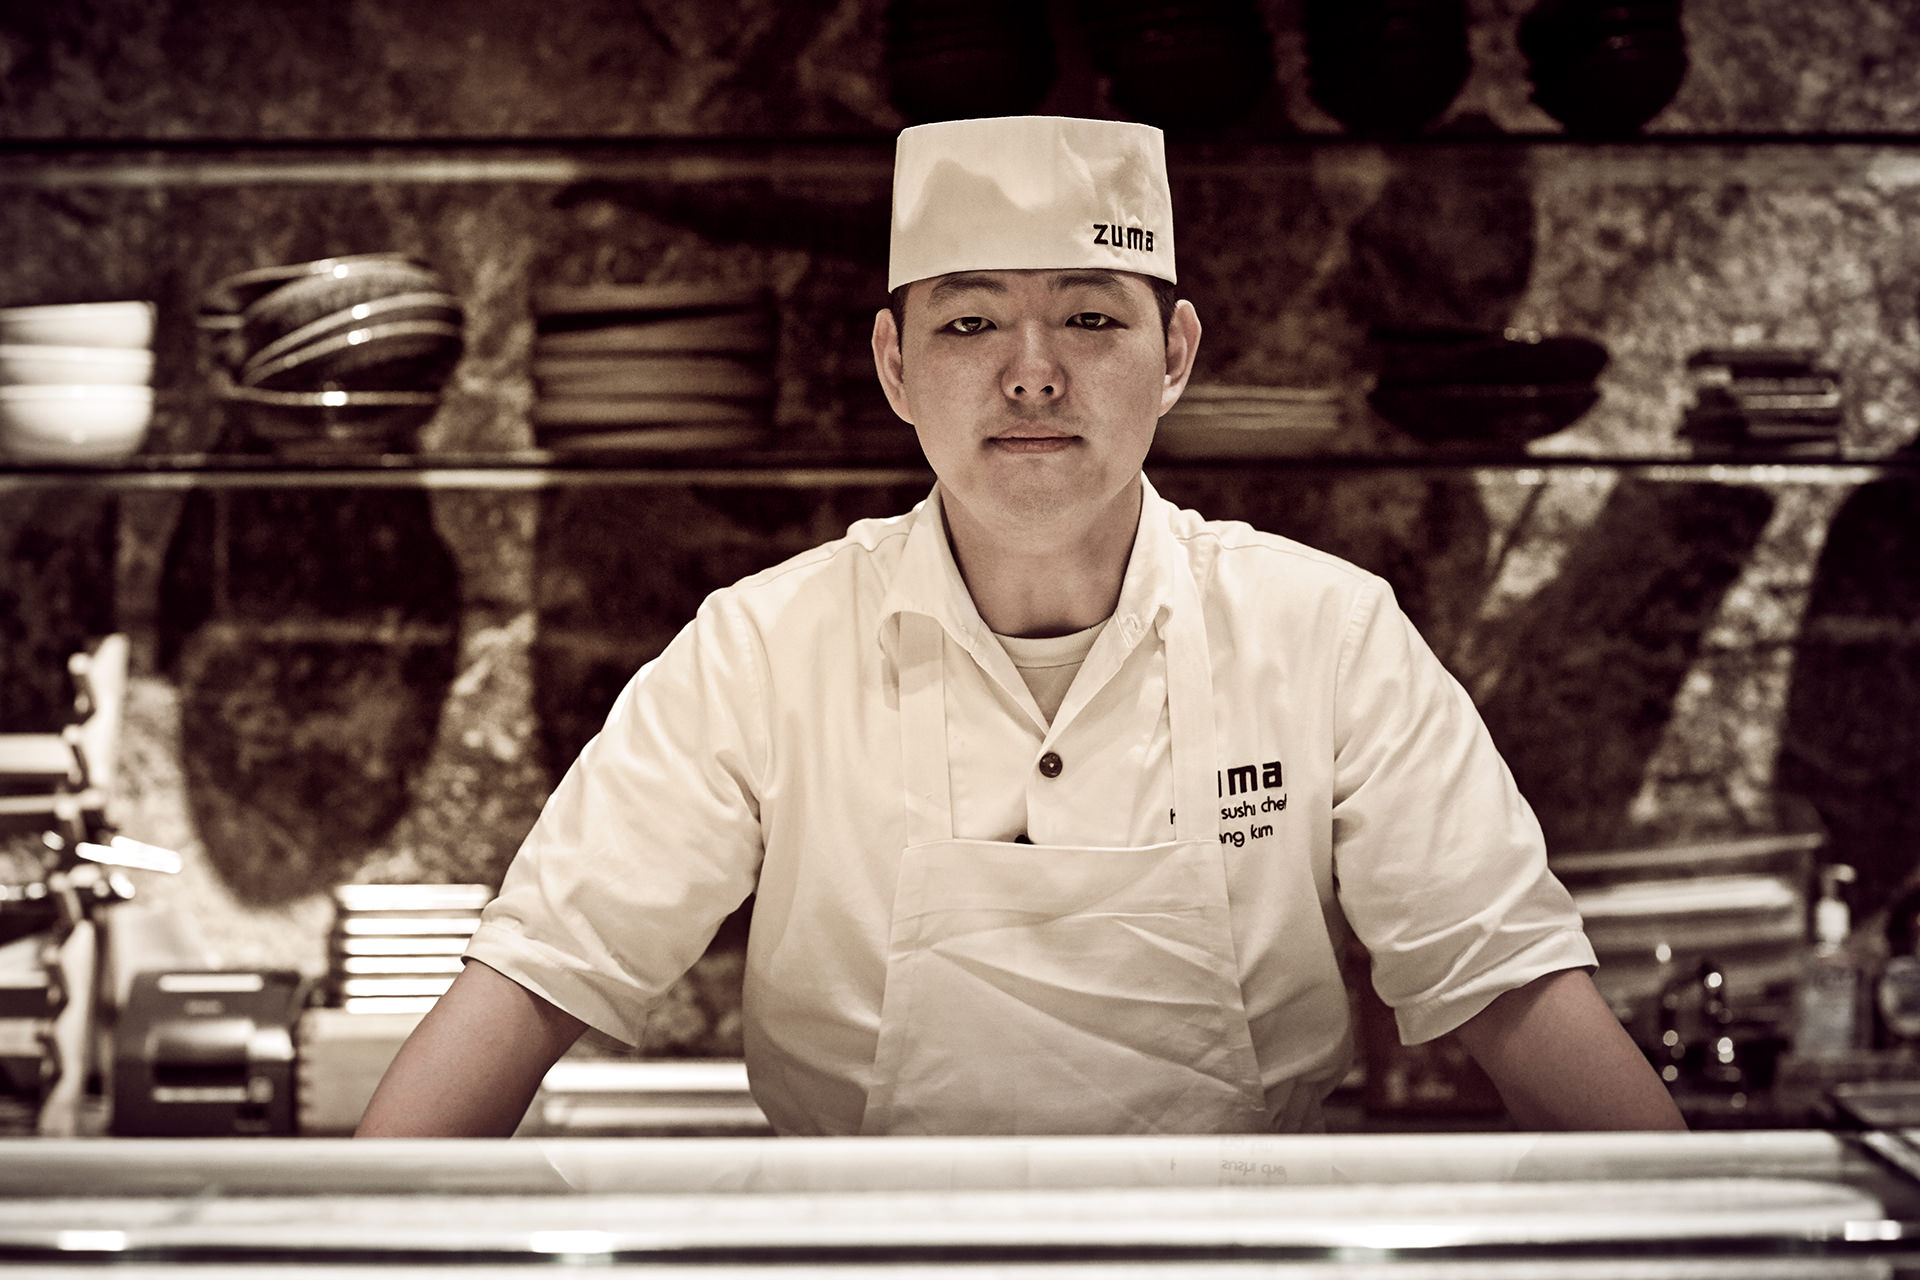 corporate-portrait-restaurant-kitchen-kwang